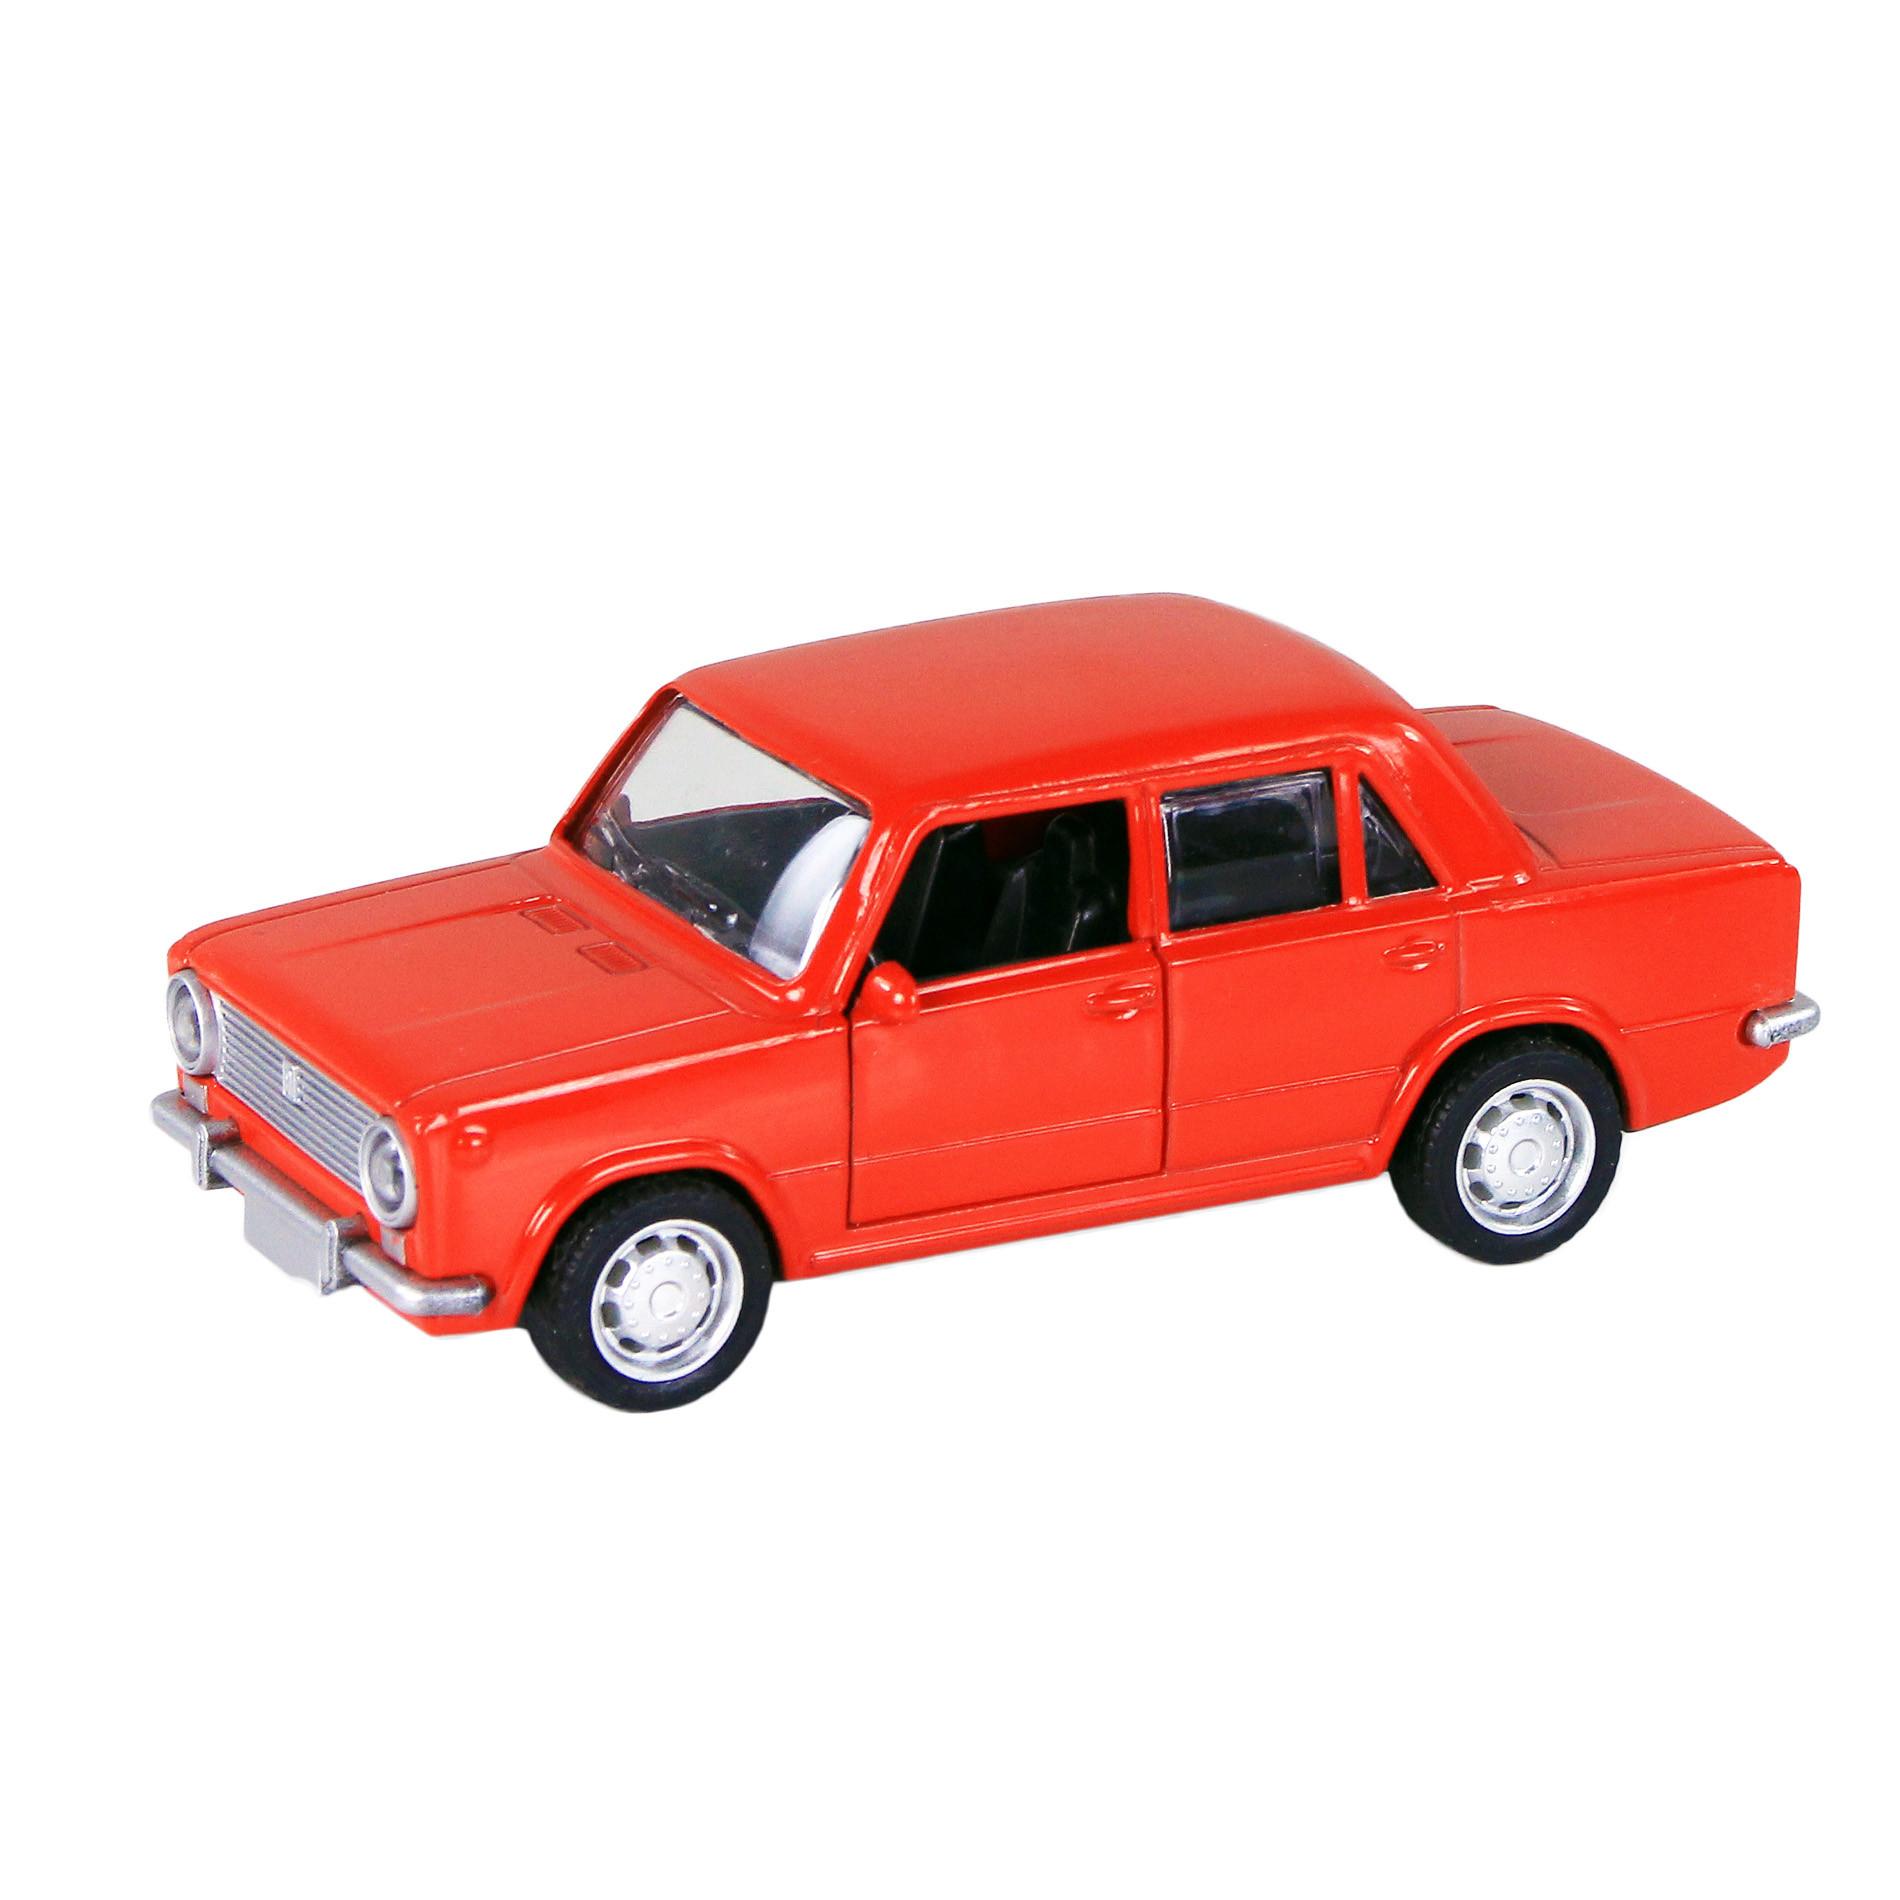 Auto kovové LADA 3 druhy (Seat/Fiat 124)